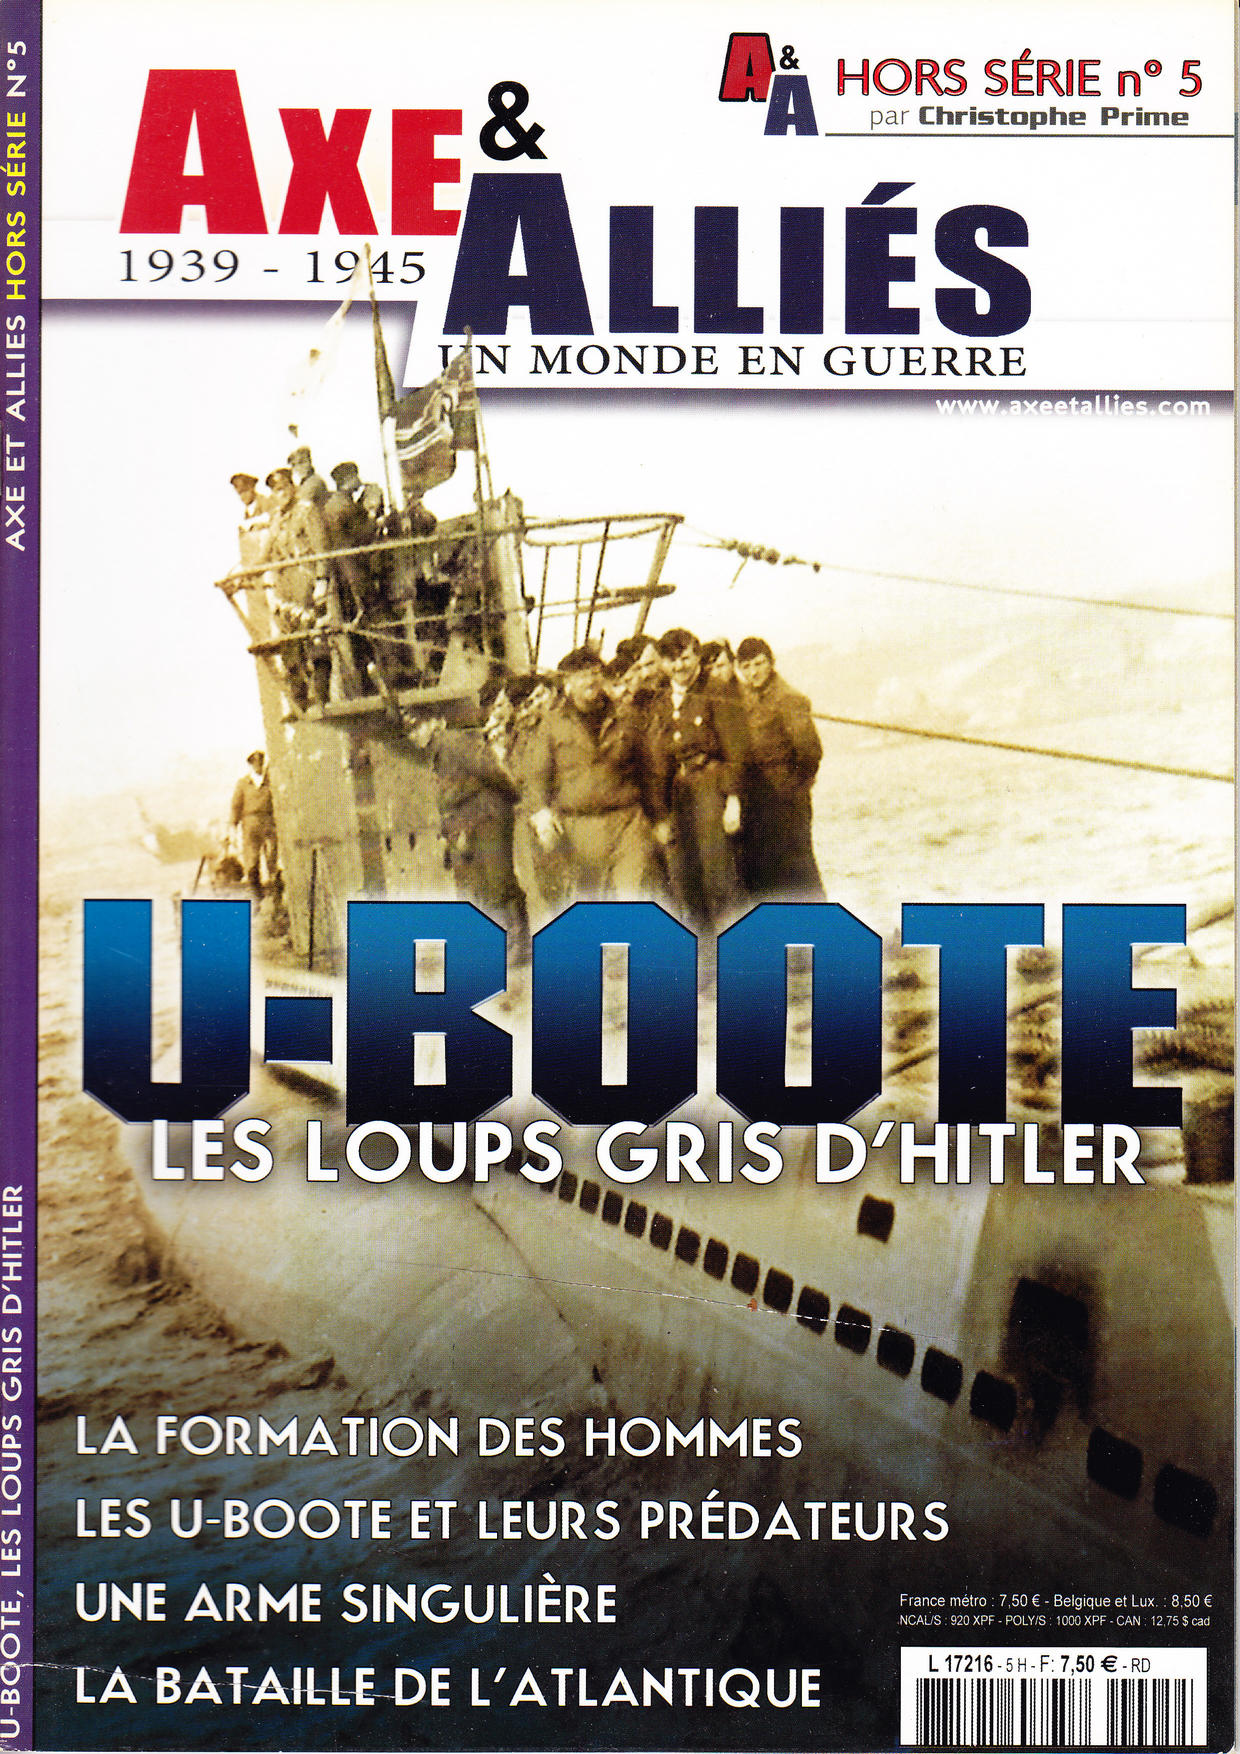 Axe & Alliés - 1939 - 1945 - Hors série 05